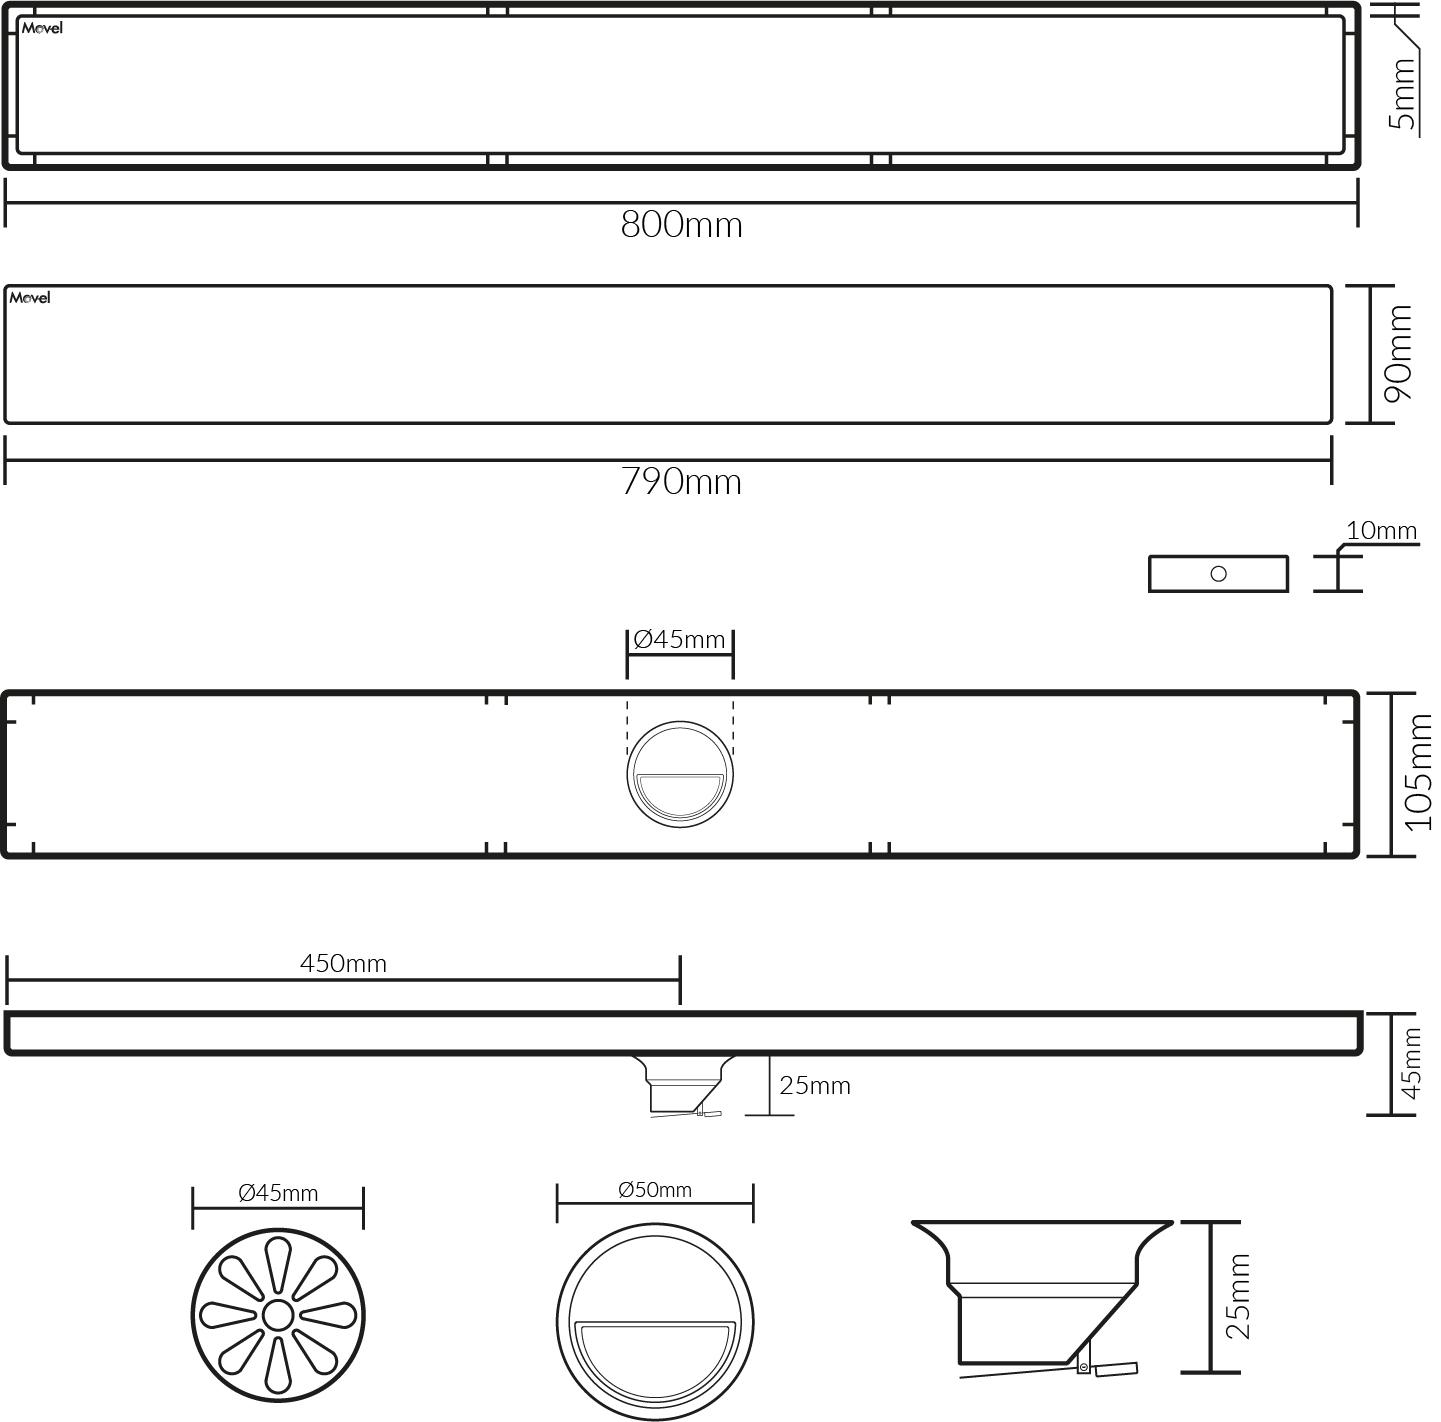 Ralo Linear Fechamento Automático Rose Gold 80x10cm